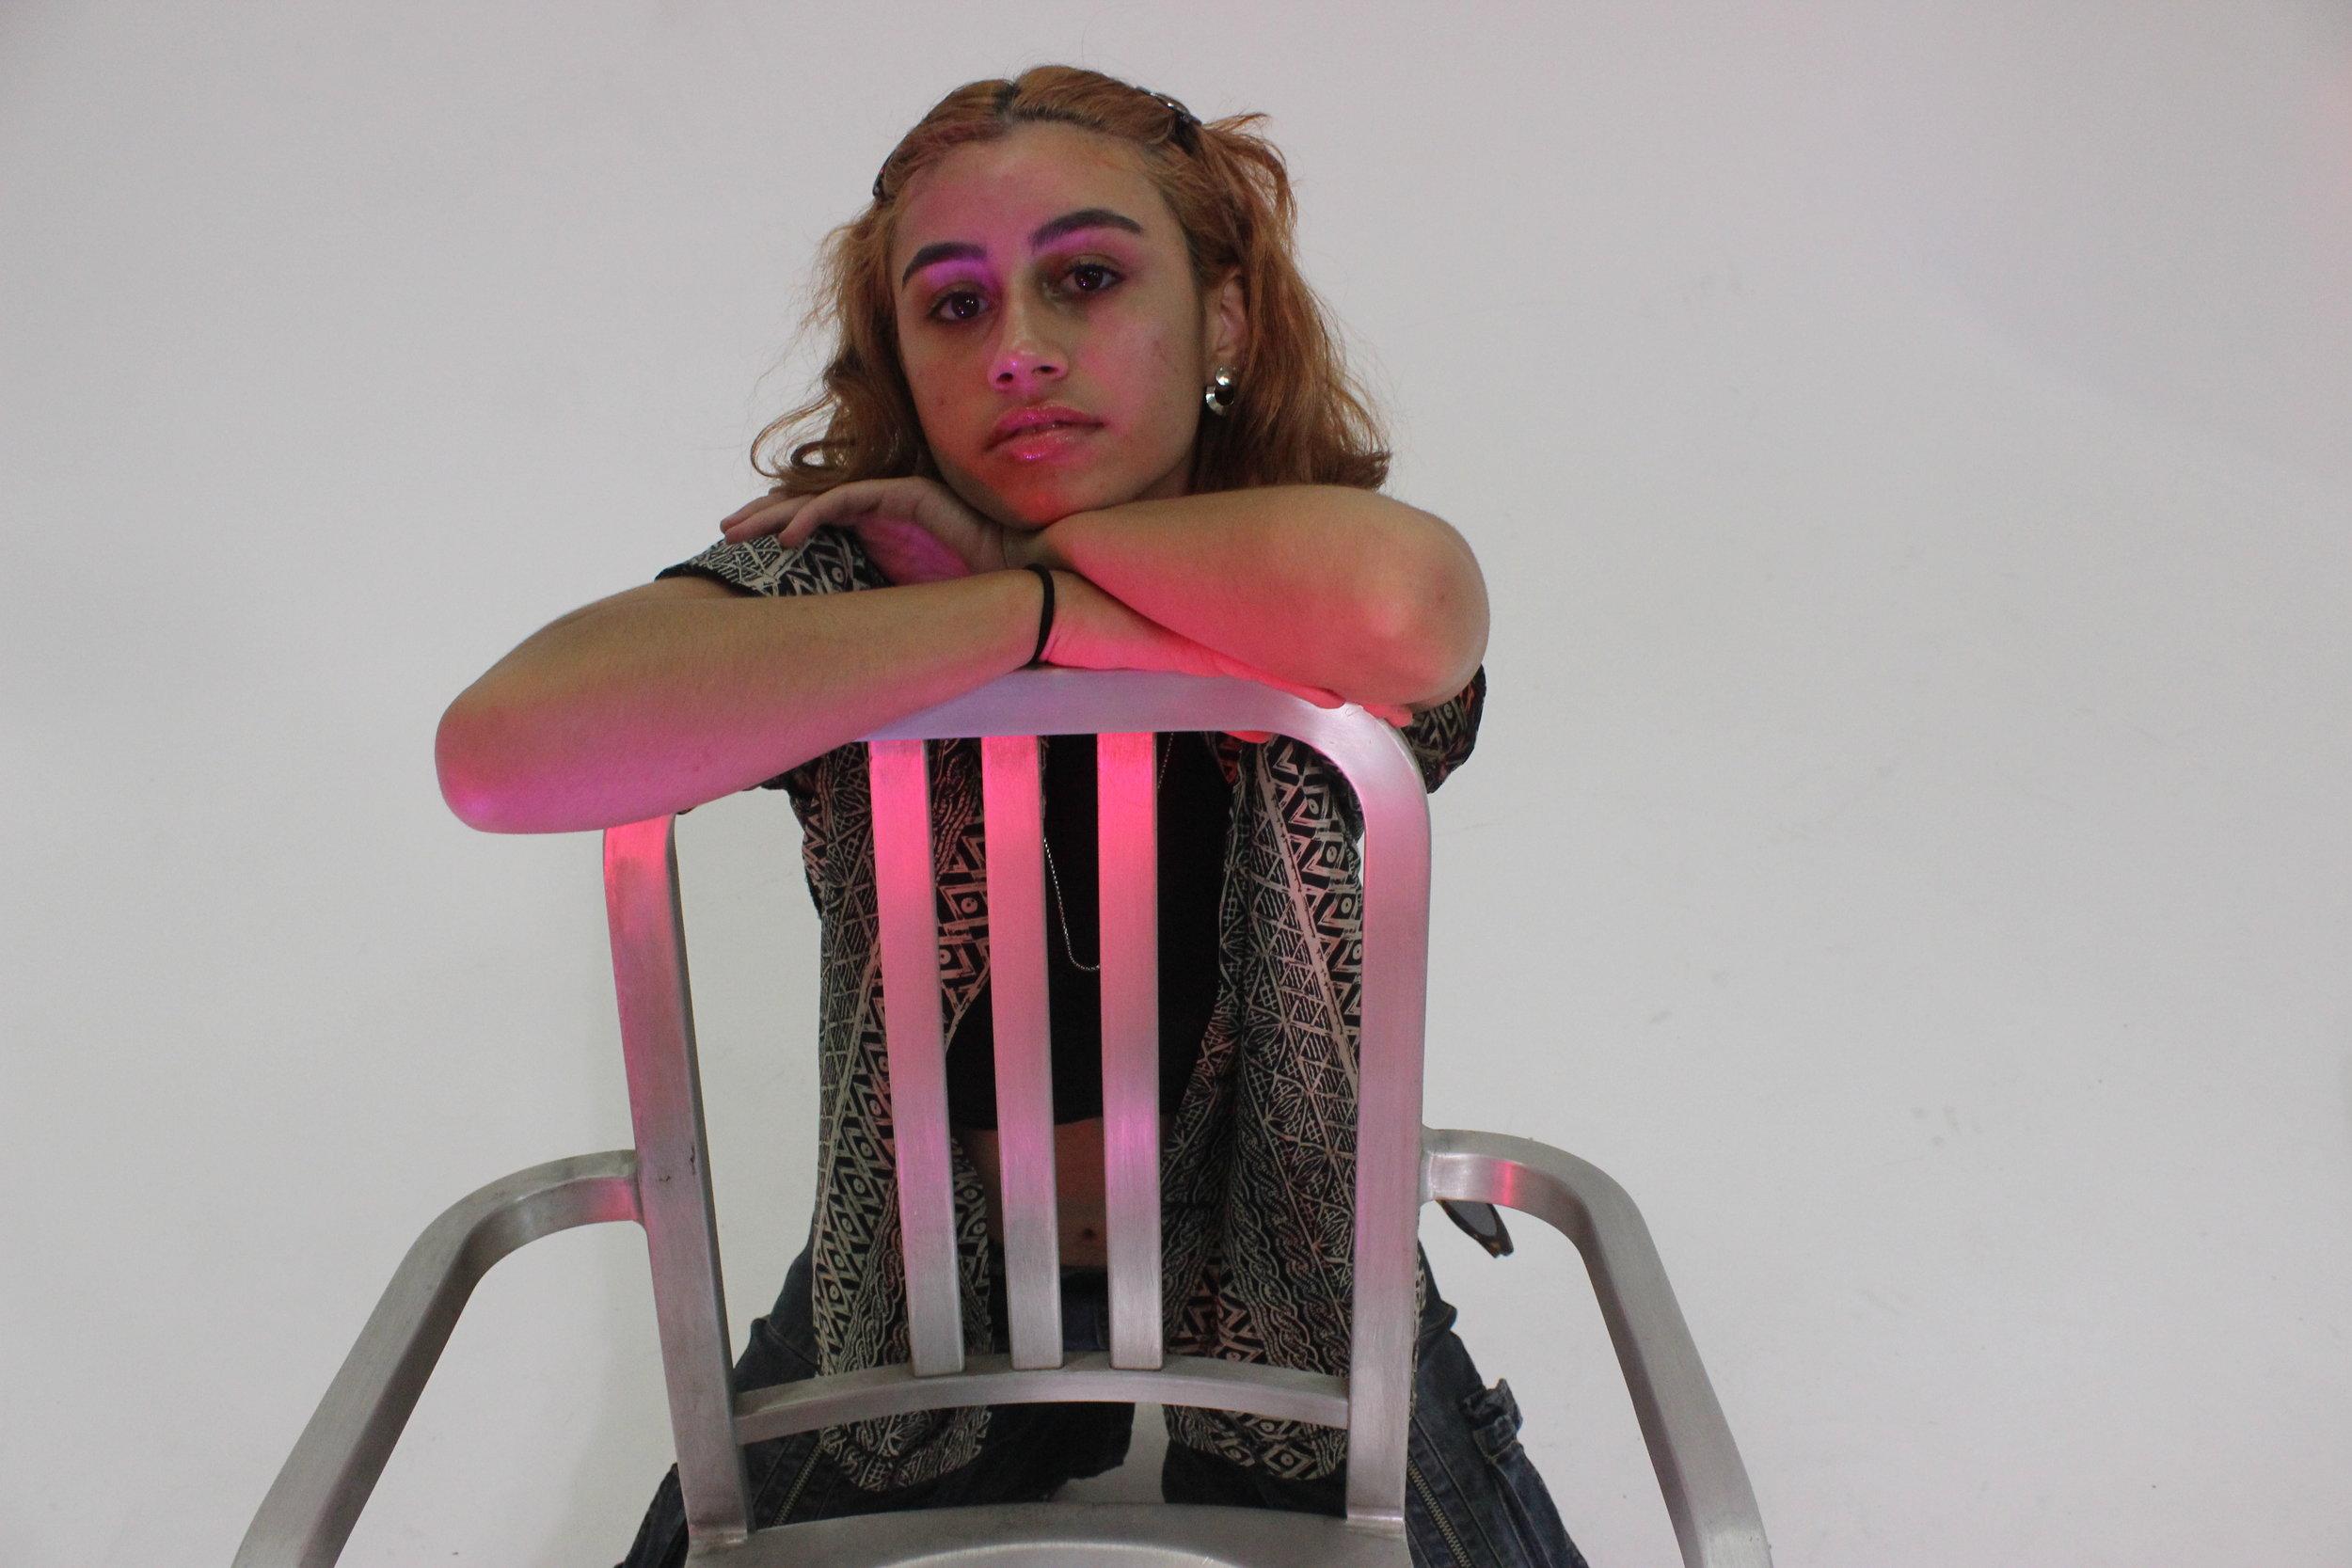 Thalia - Artist and Singer